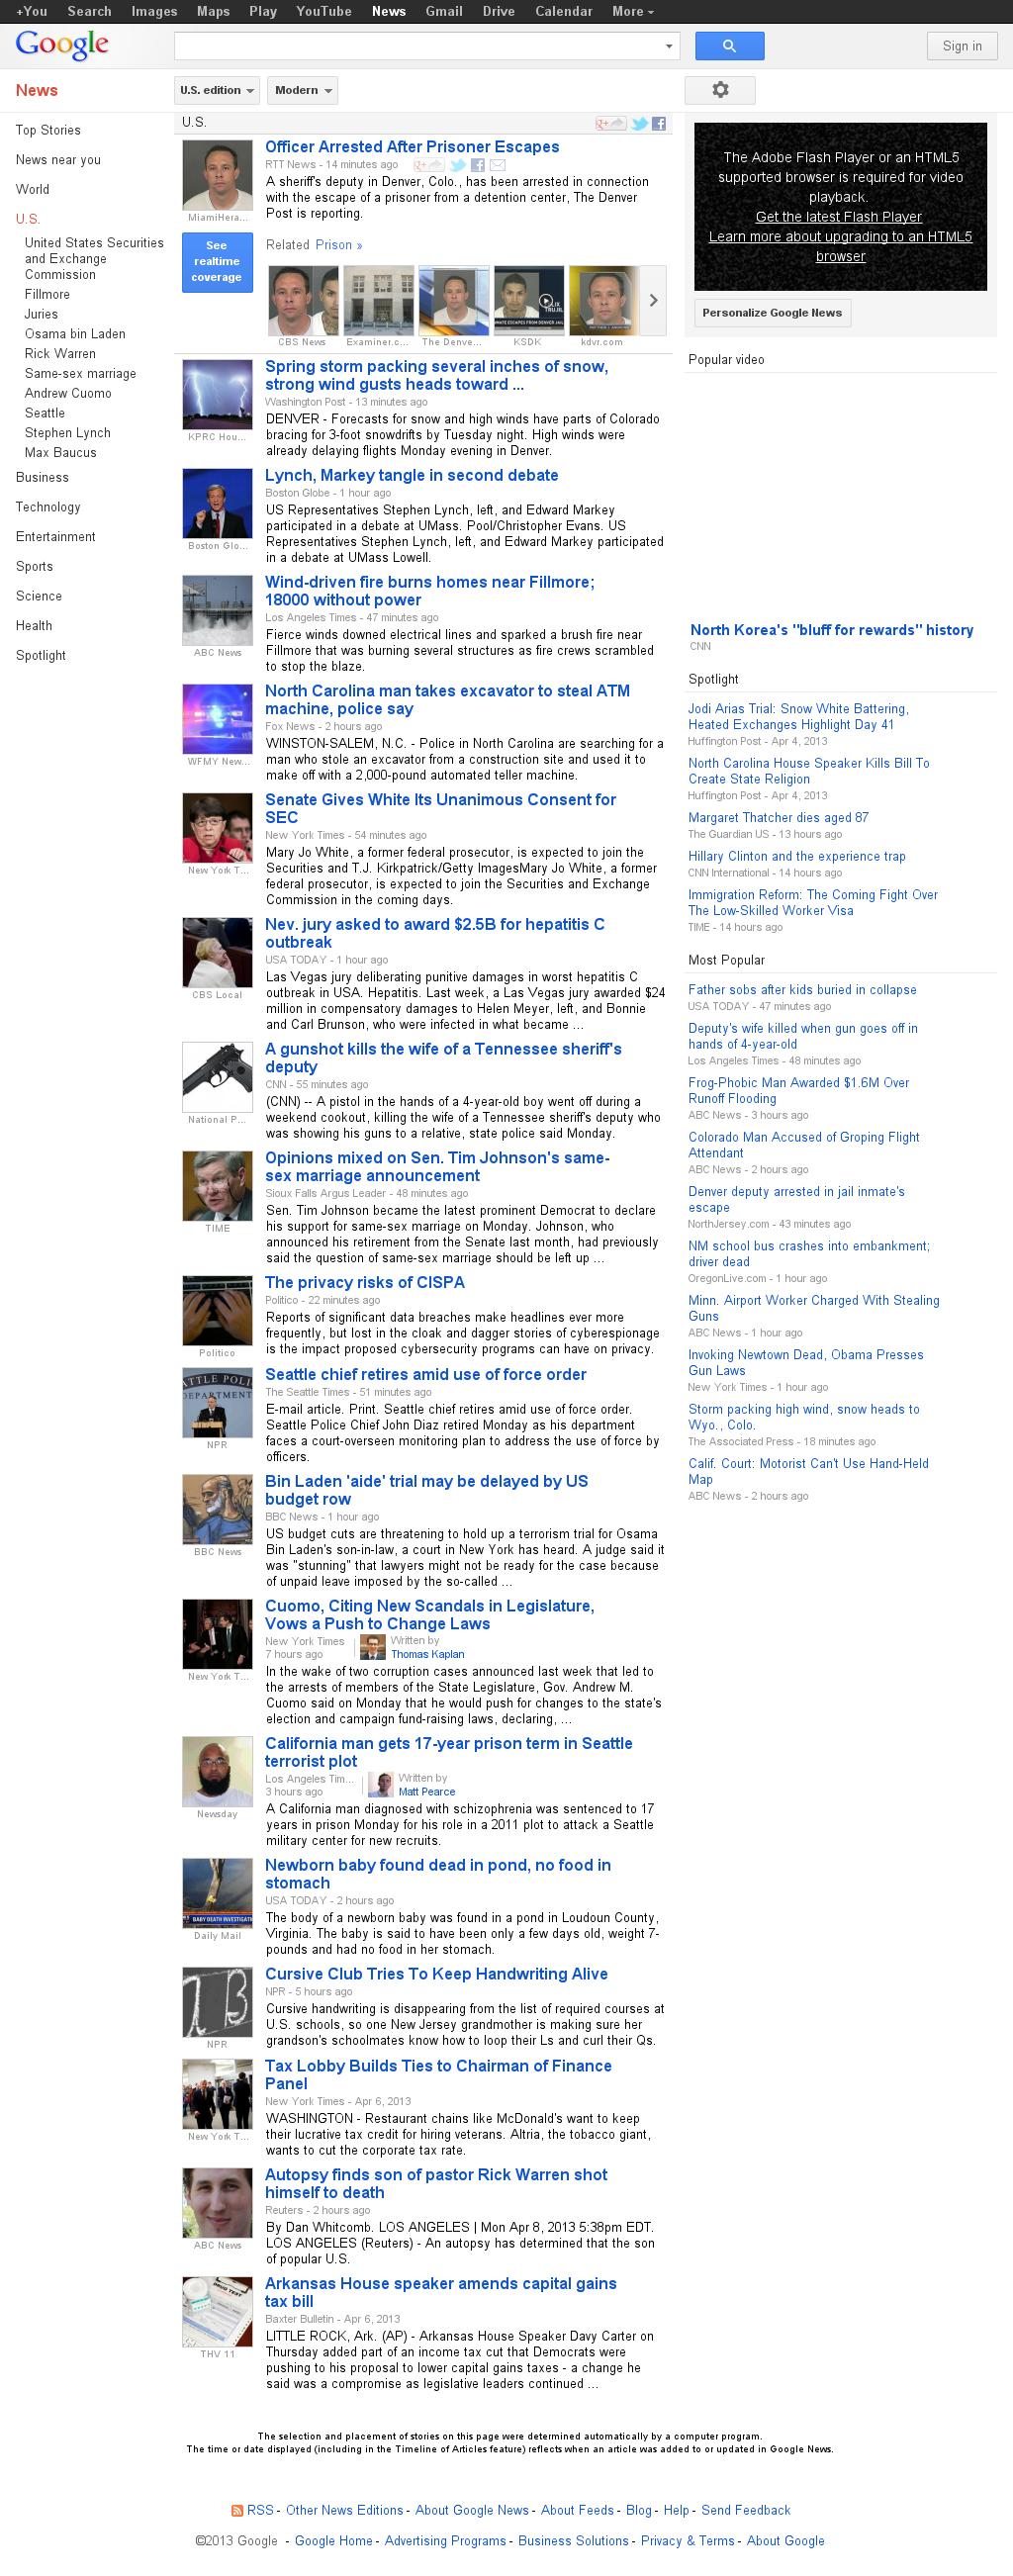 Google News: U.S. at Tuesday April 9, 2013, 2:09 a.m. UTC